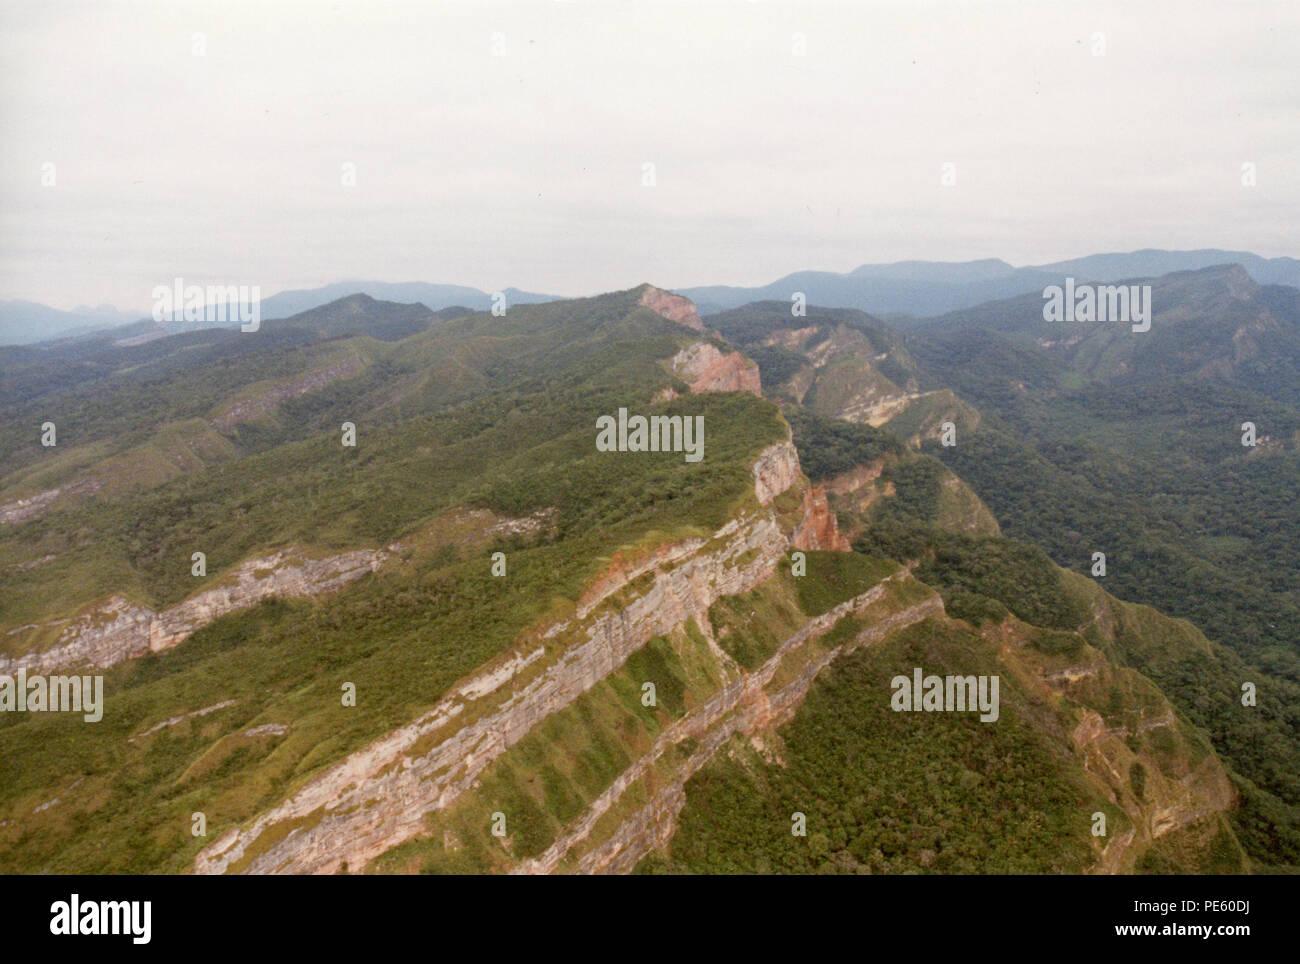 Aerial snapshot of grassy mountains. - Stock Image